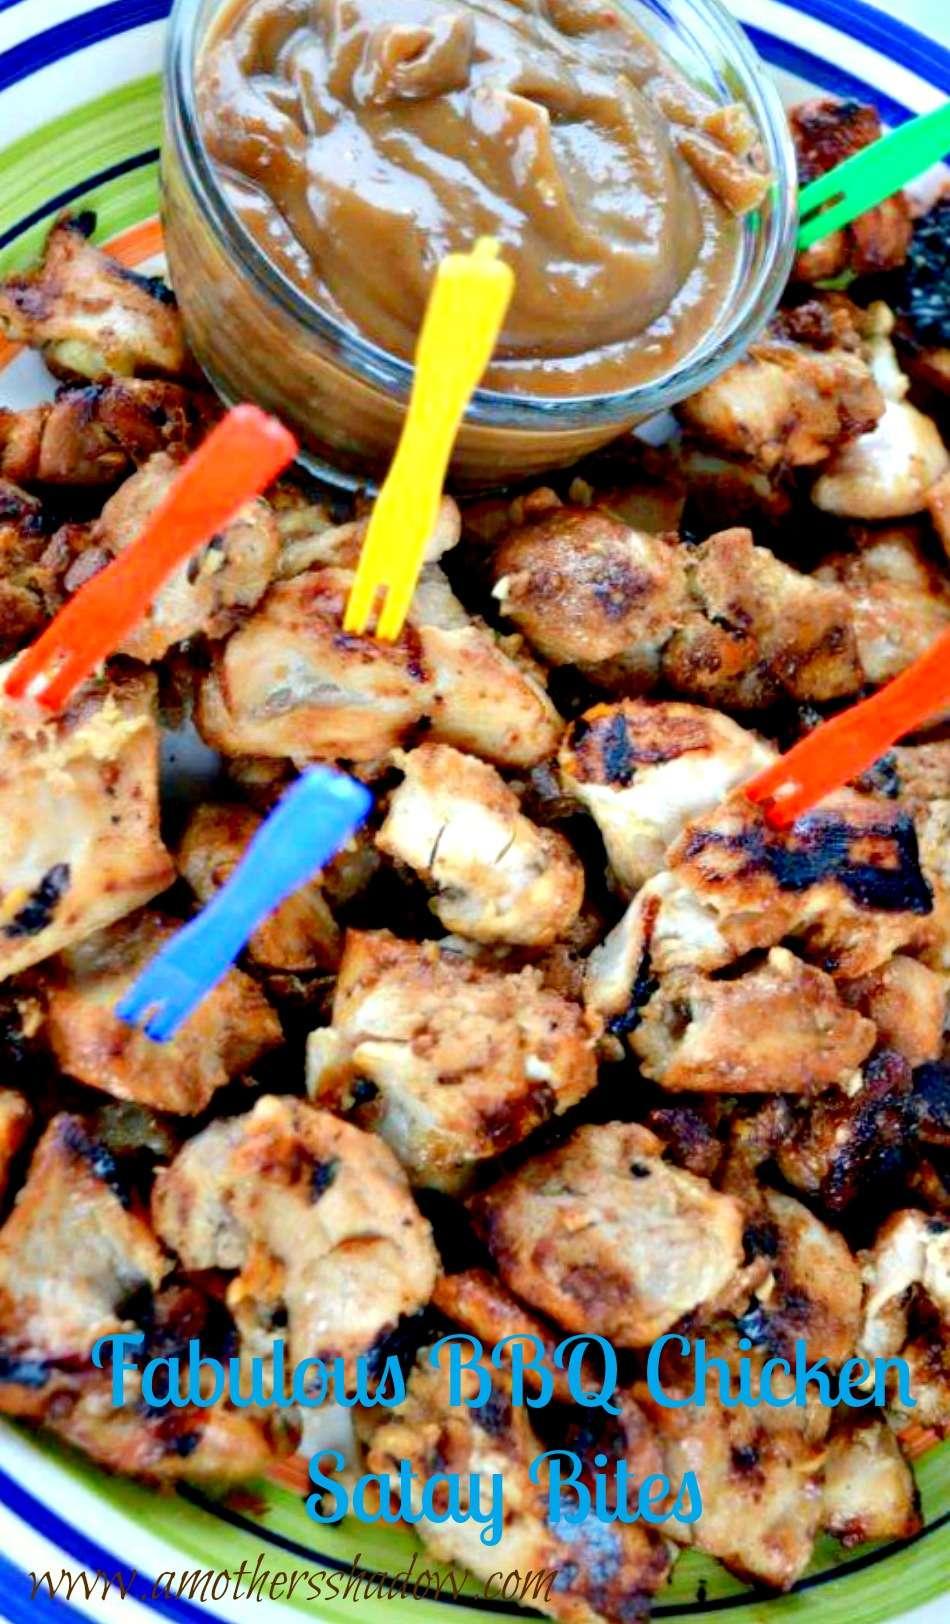 Fabulous BBQ Thai Chicken Satay Bites